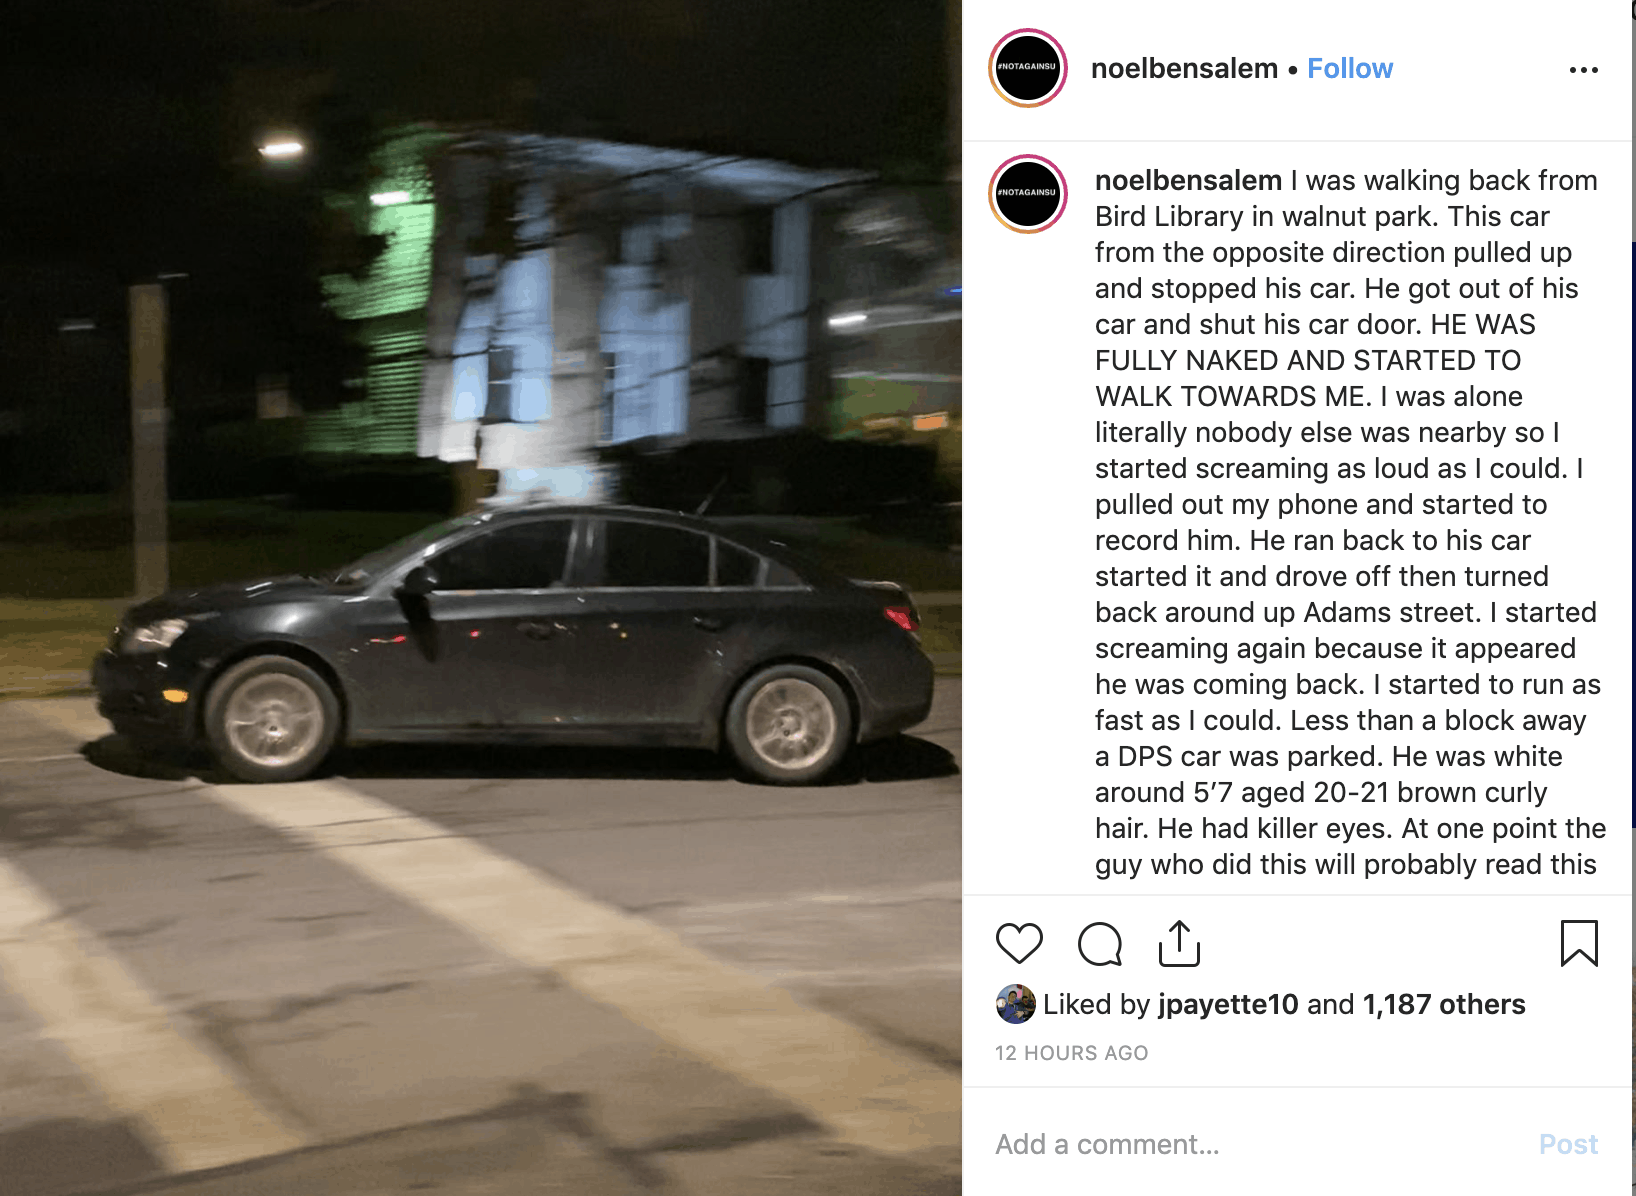 Instagram post regarding sexual harassment report on Walnut Place on Nov. 19, 2019.